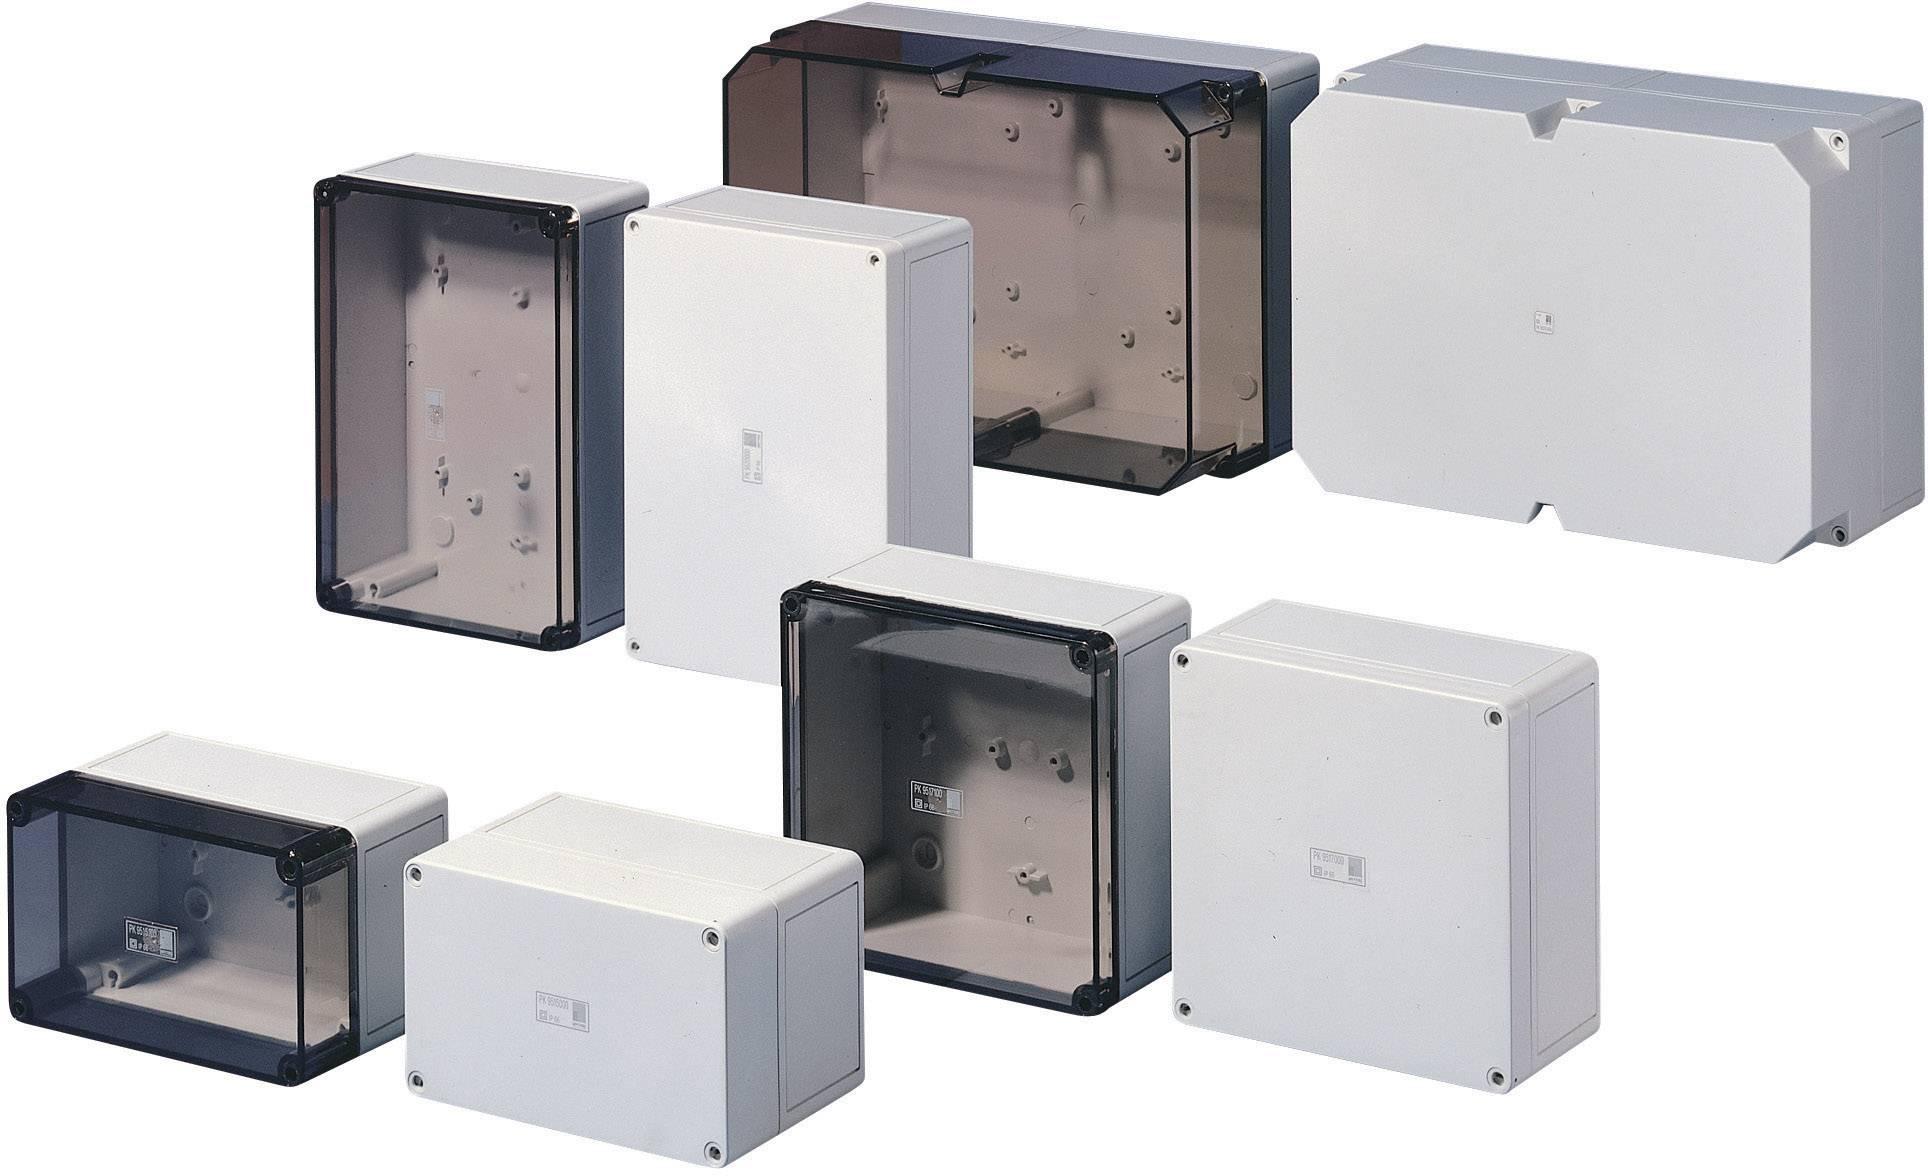 Instalační krabička Rittal PK 9507.000 110 x 110 x 90 polykarbonát světle šedá 1 ks